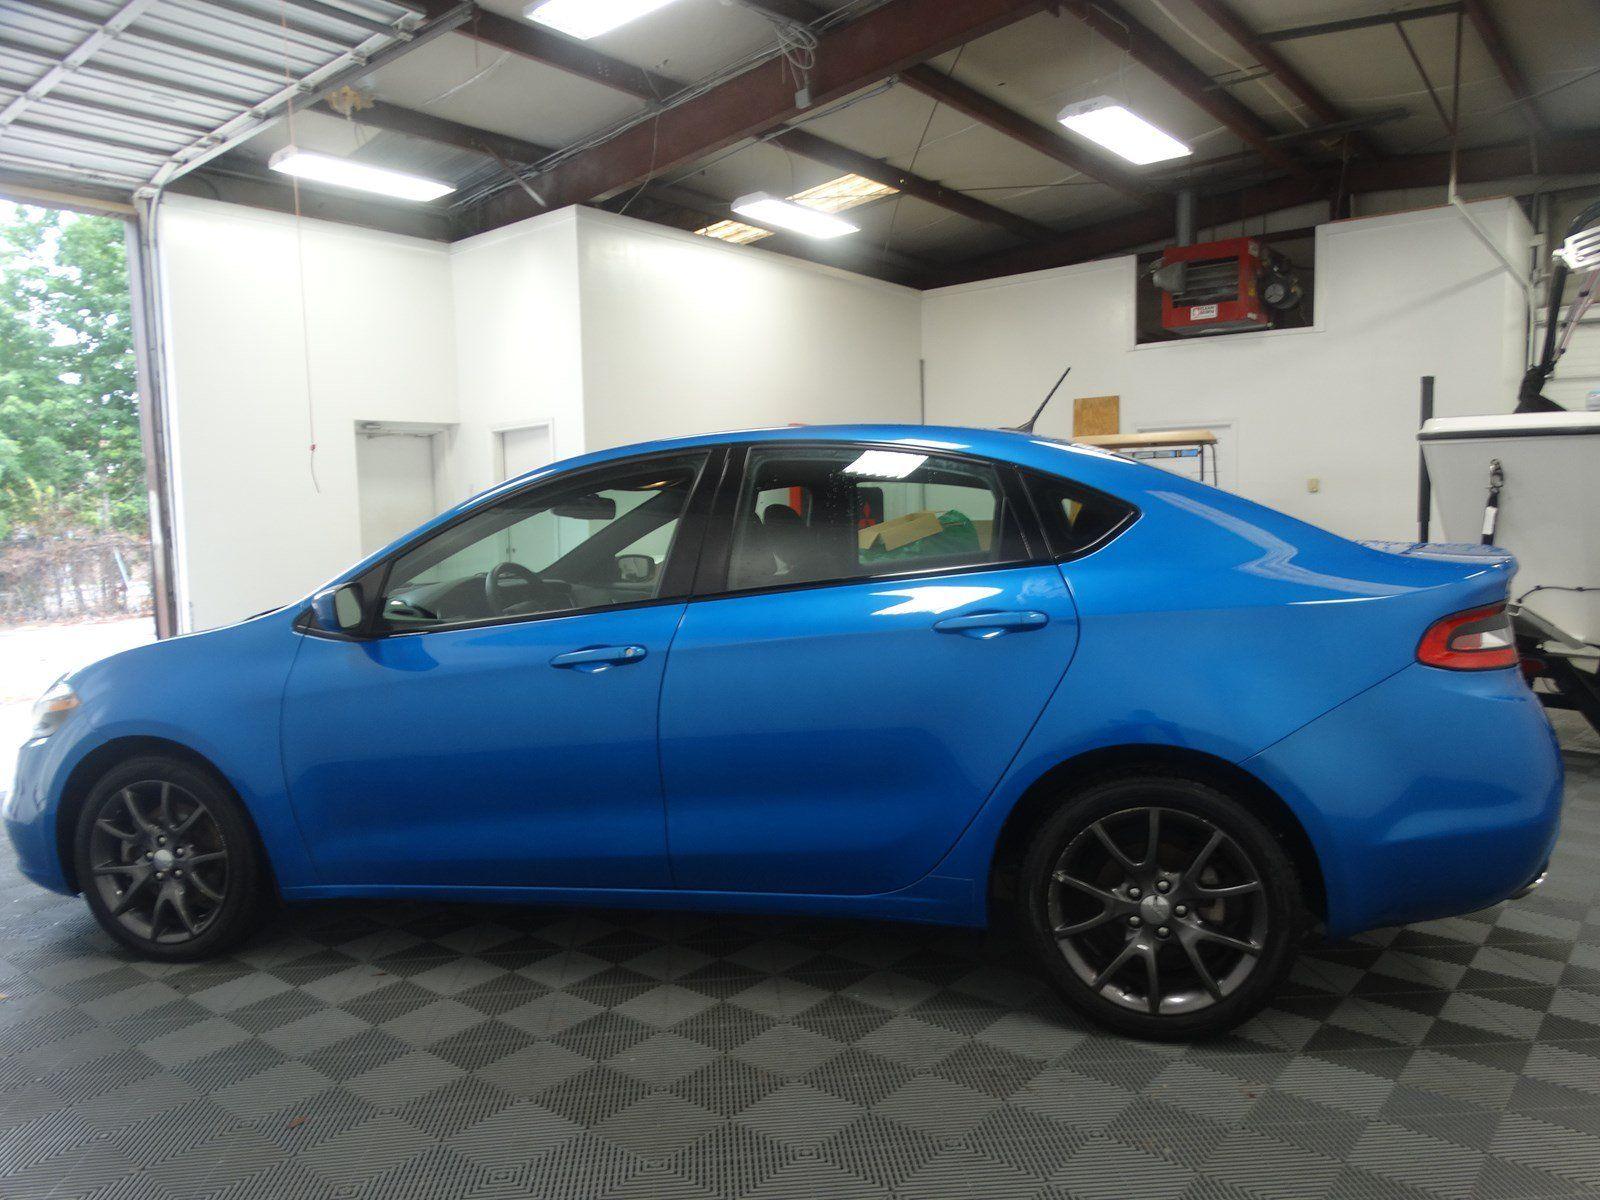 LittleJoesAuto Chesapeake VA UsedCars Dealership AutoSales